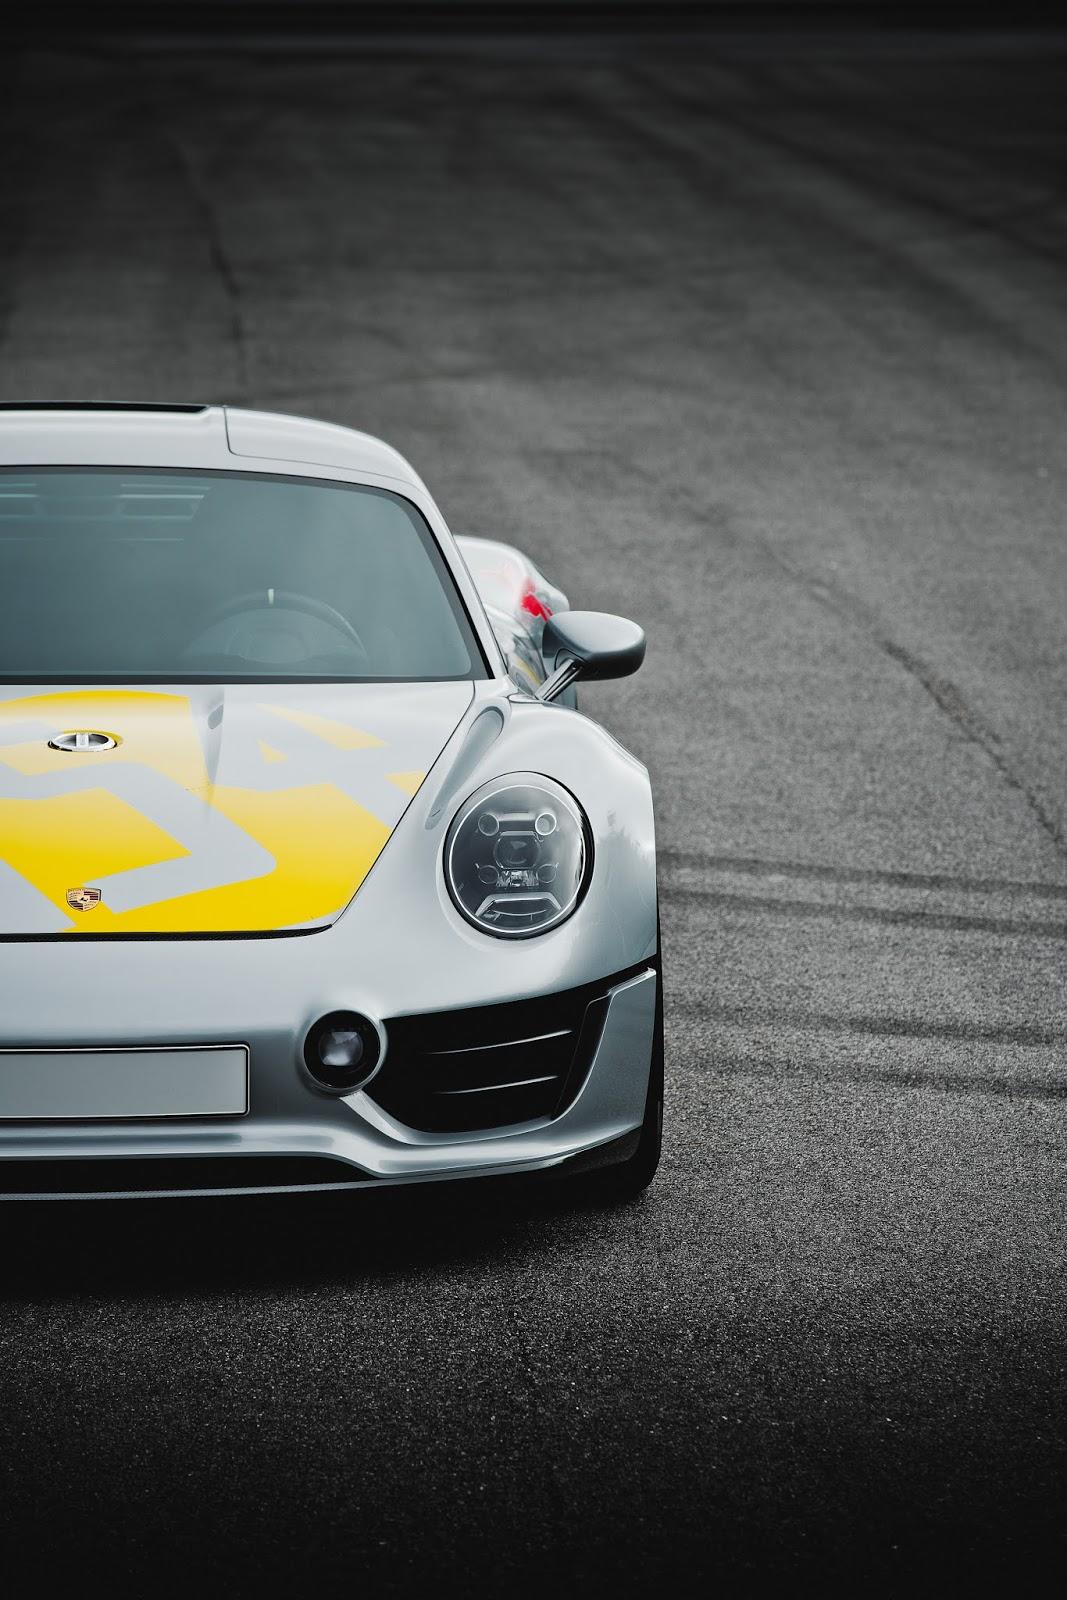 CVS0664 Le Mans Living Legend : Το πρωτότυπο που γέννησε την 718 Cayman GT4 LE MANS, Porsche, Porsche Le Mans, Porsche Unseen, sportscar, supercar, supercars, zblog, ειδήσεις